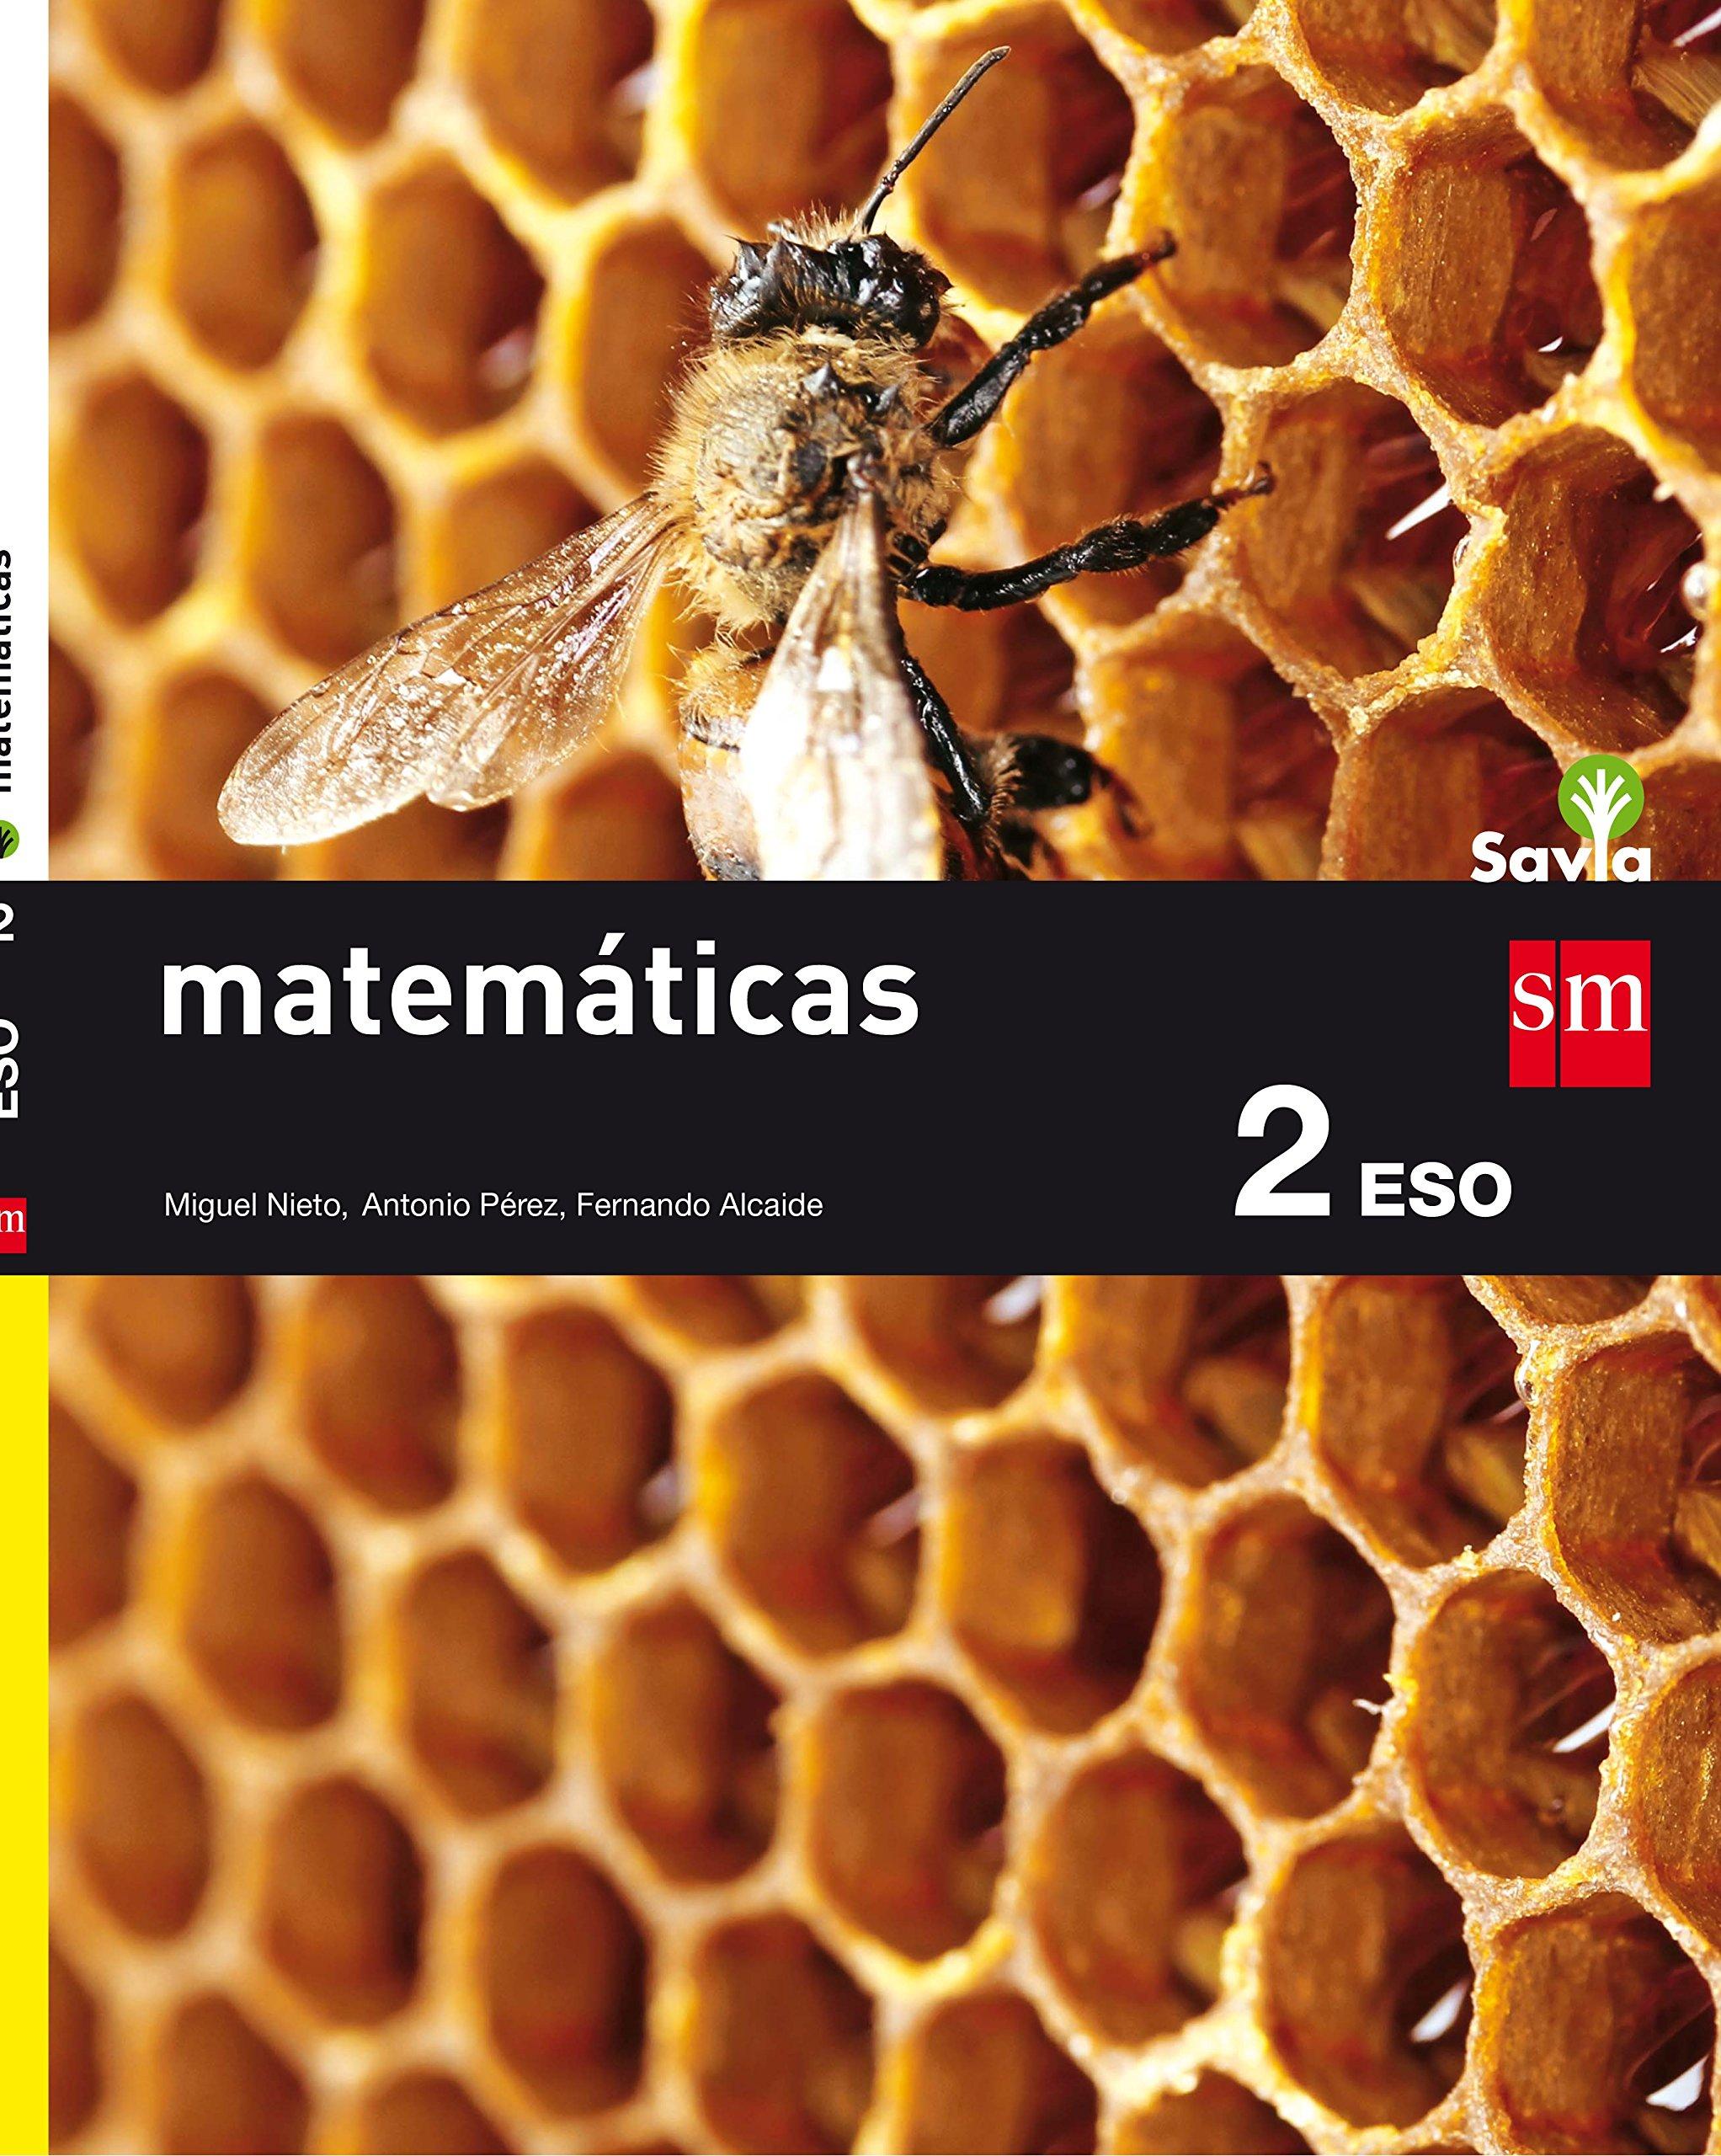 Matemáticas. 2 ESO. Savia - 9788467586787: Amazon.es: Nieto ...